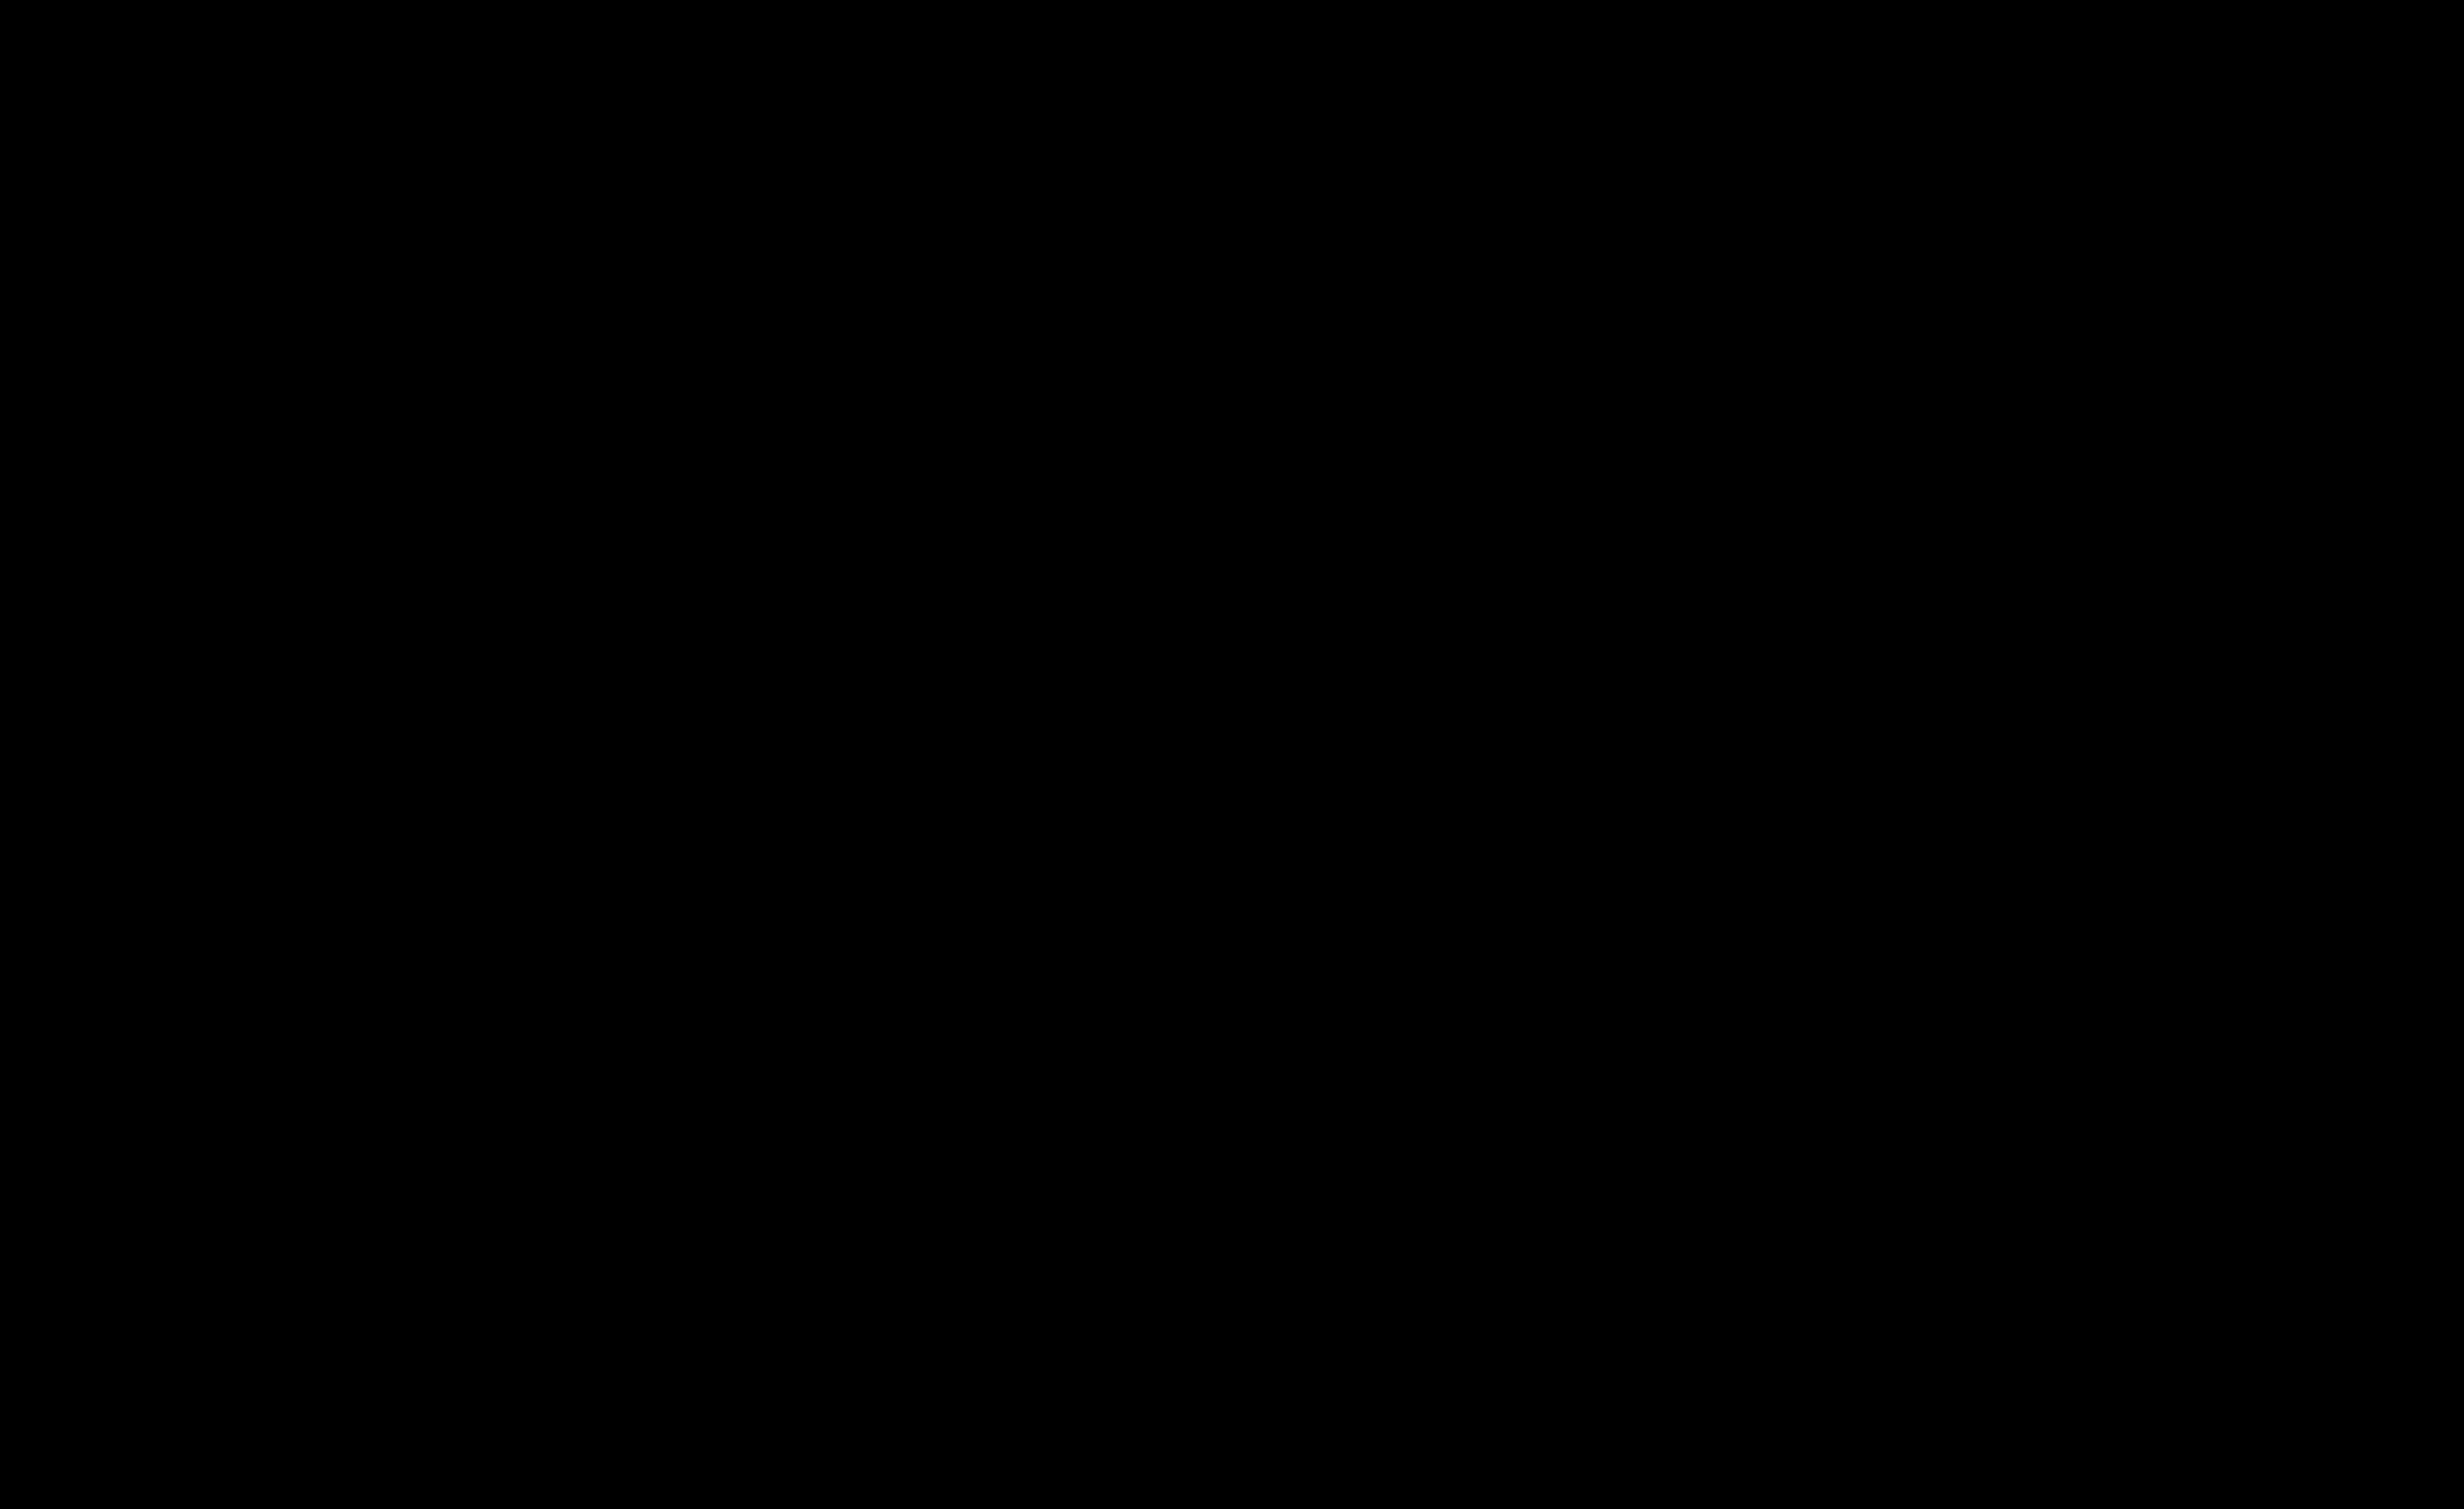 logo-P2R